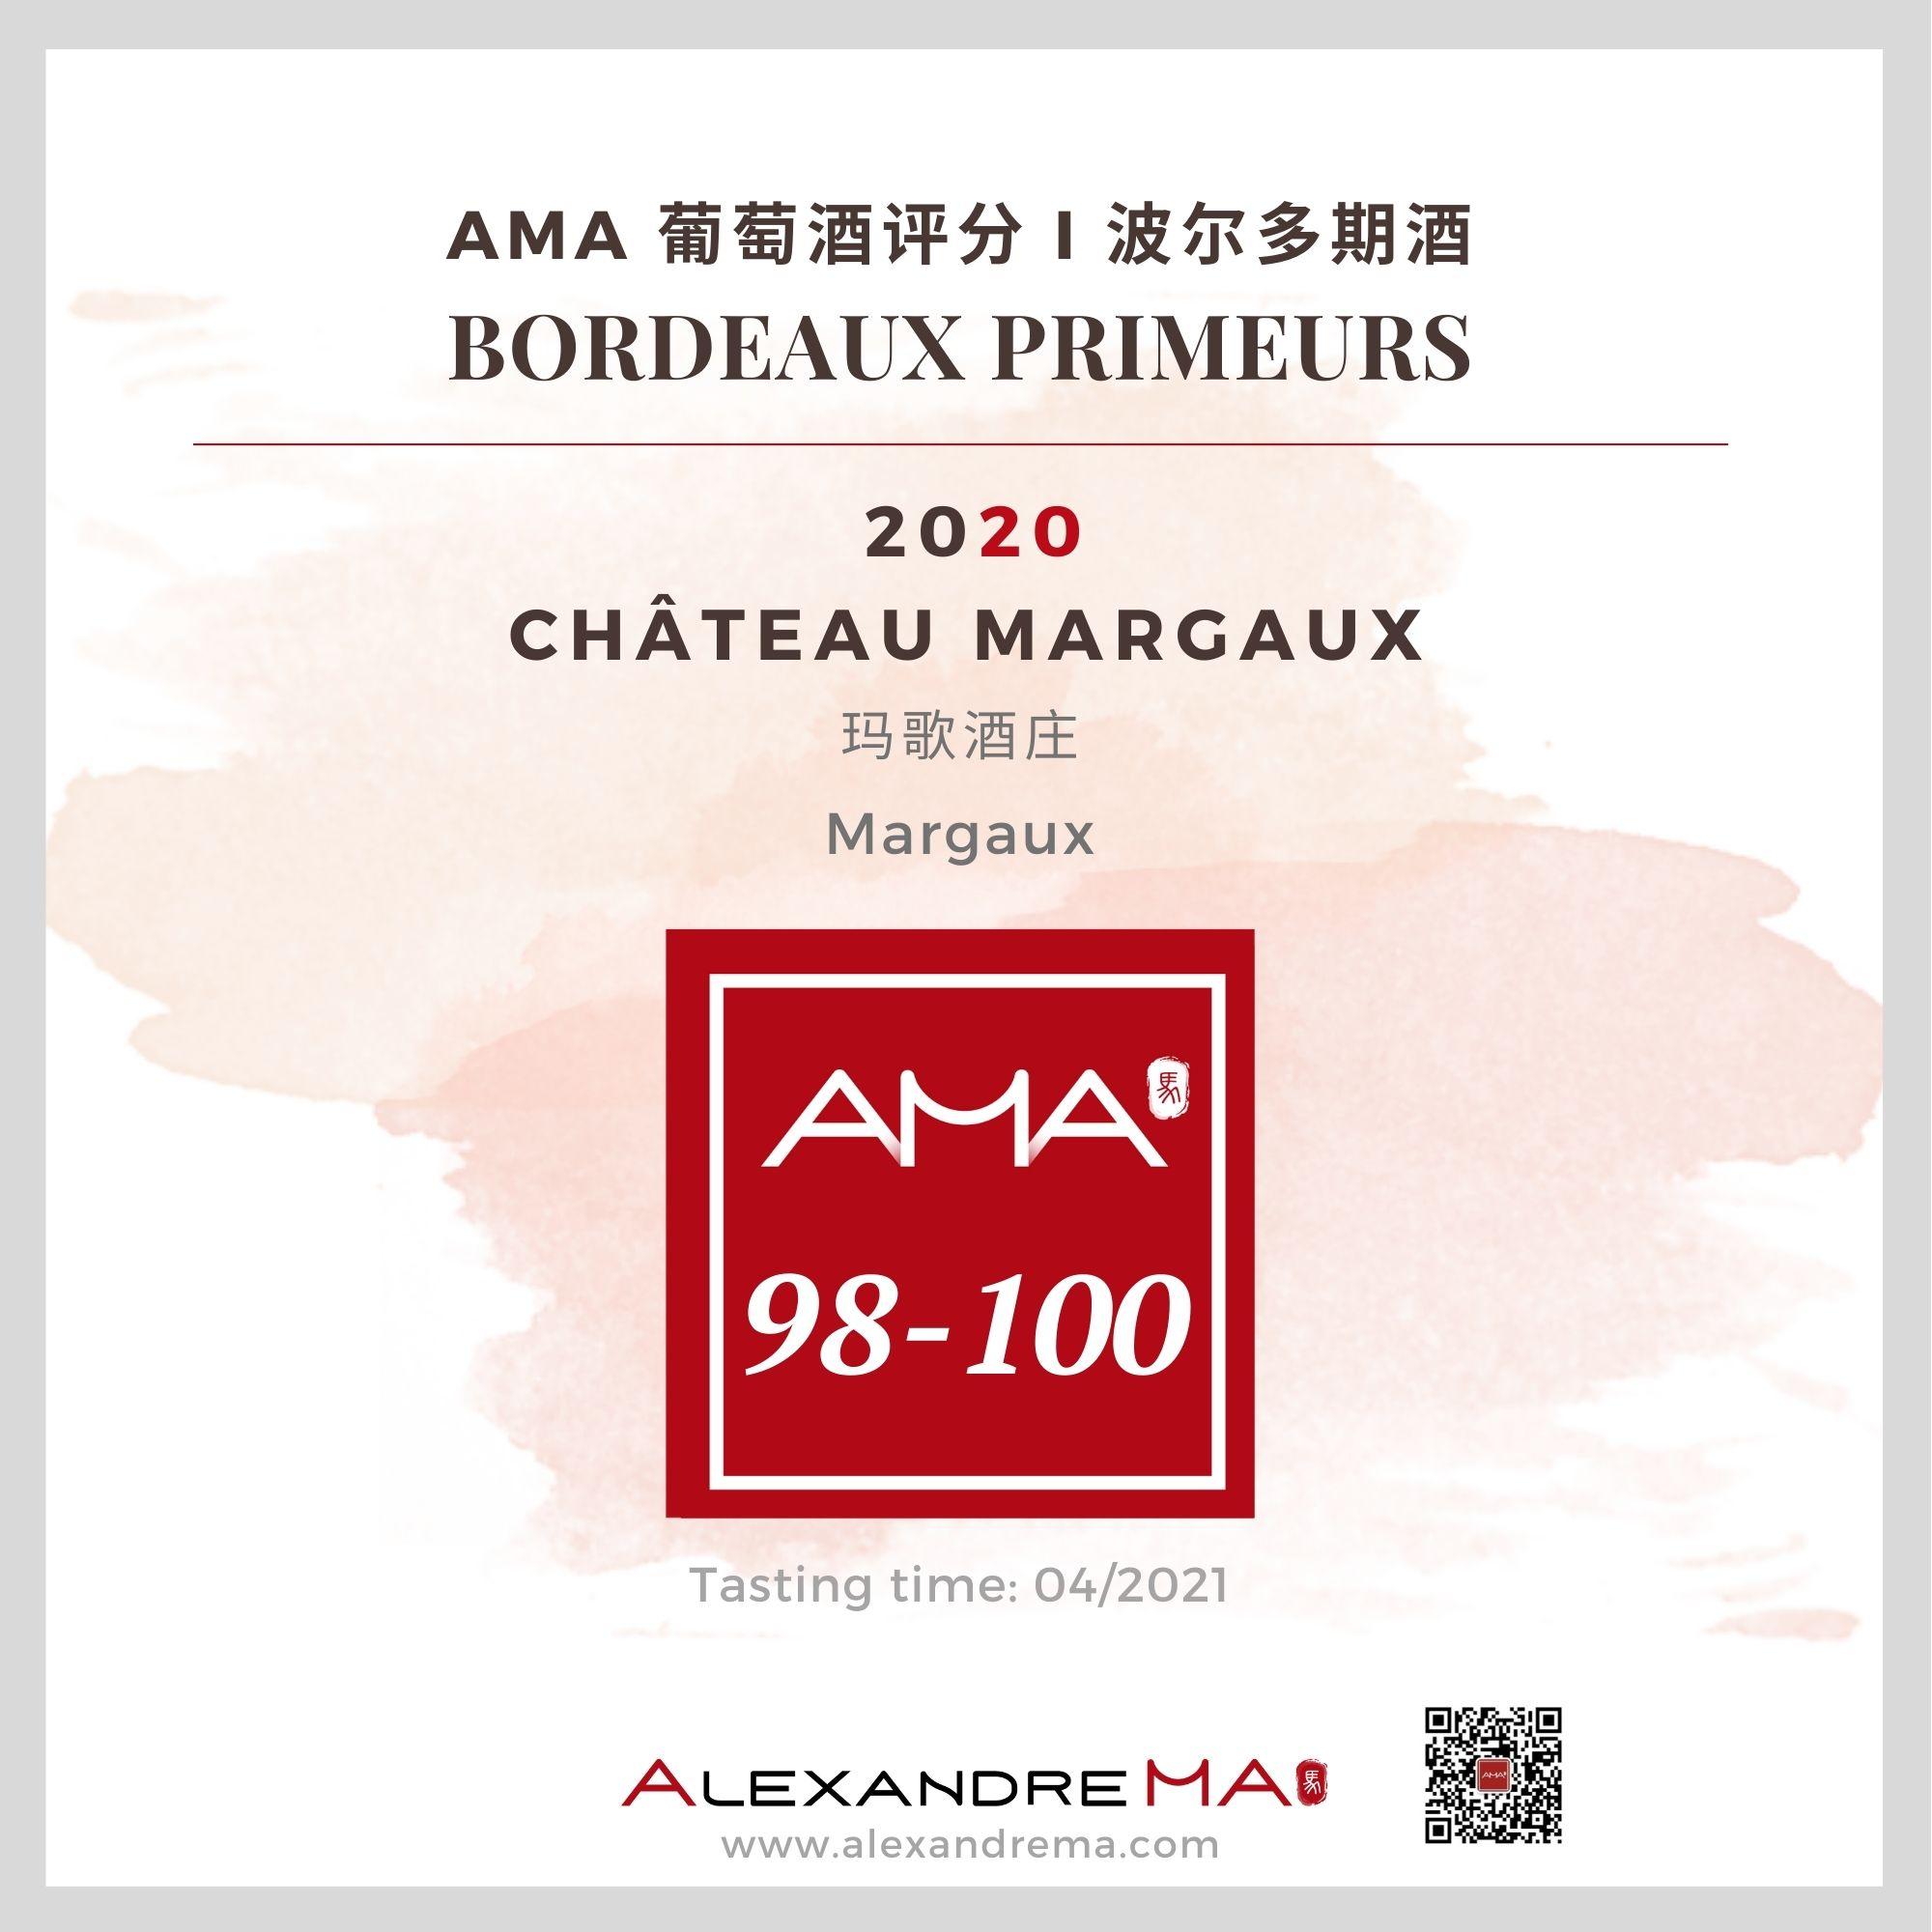 Château Margaux 2020 - Alexandre MA